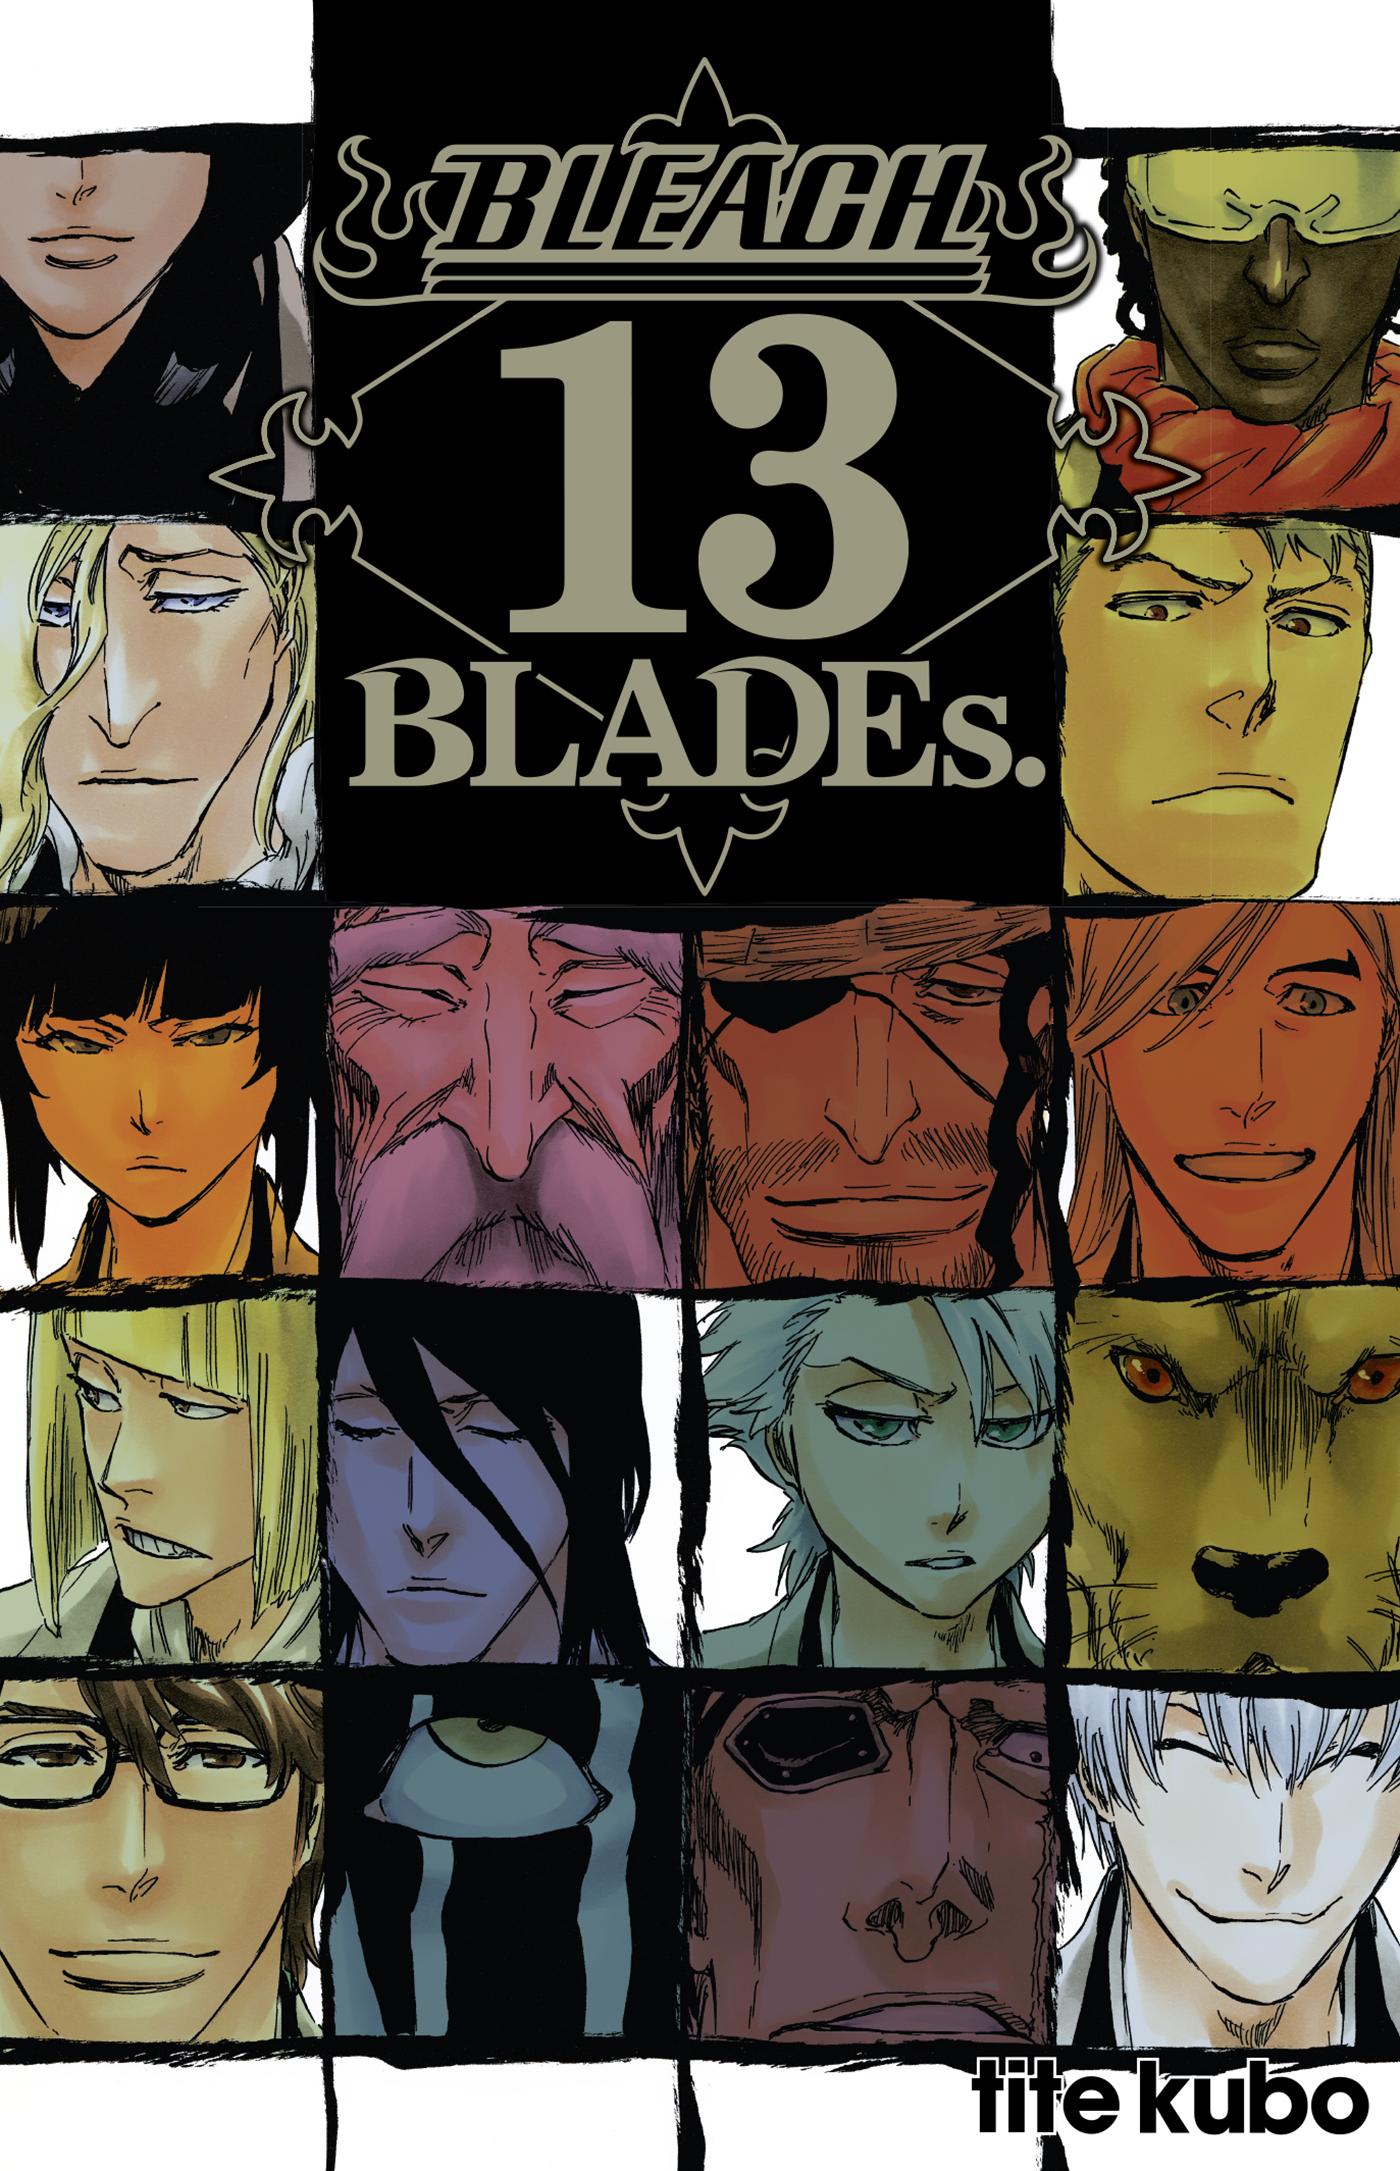 Bleach 13 BLADEs Fanbook